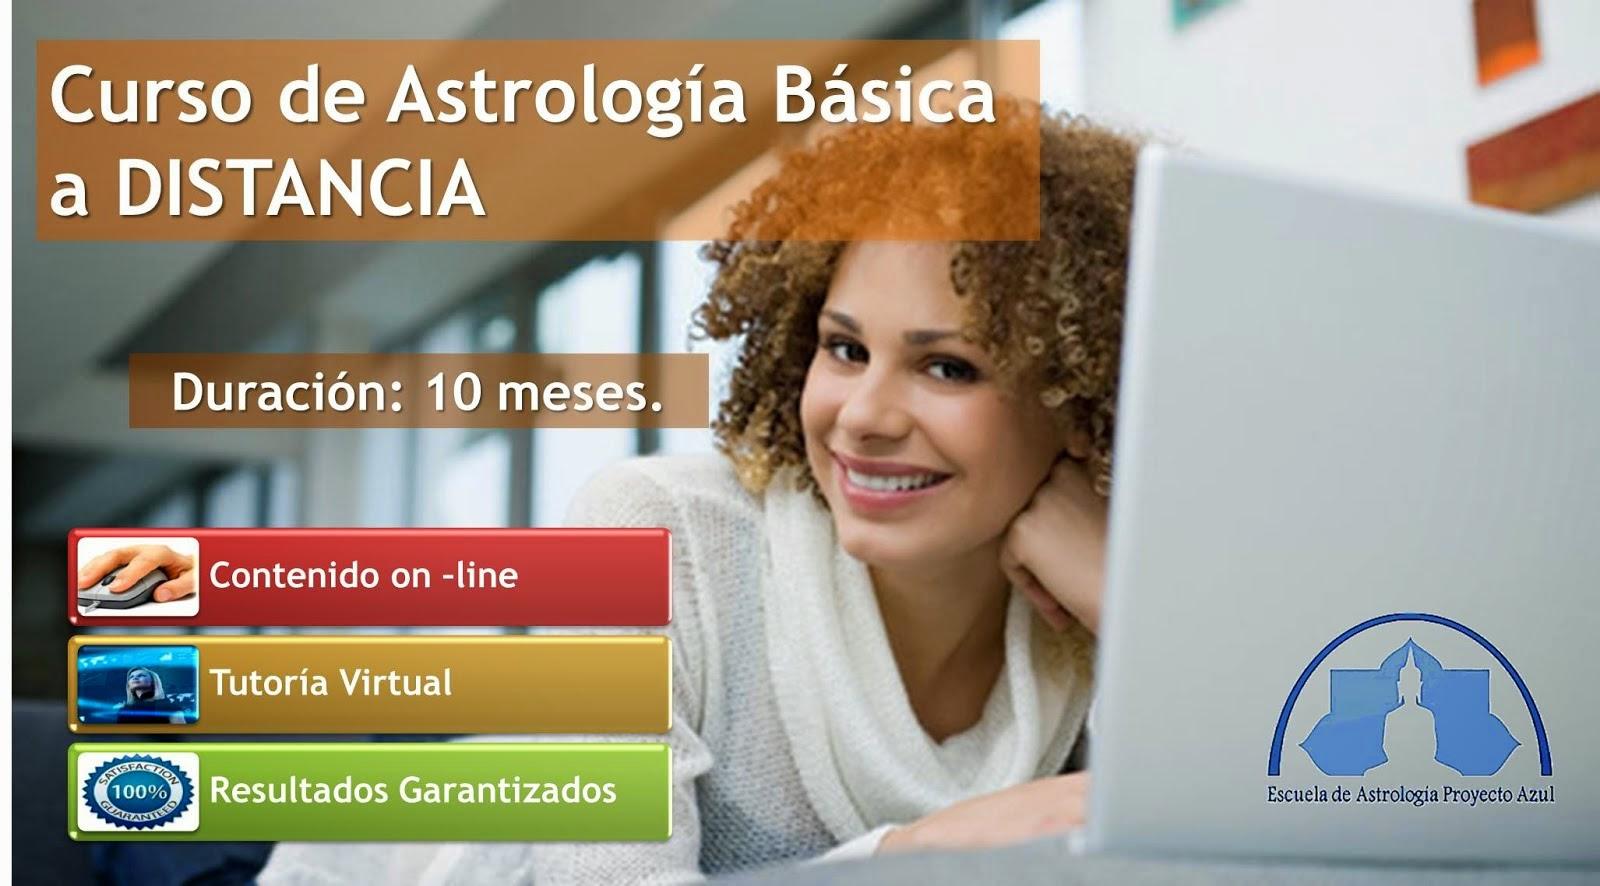 Curso de Astrología a Distancia